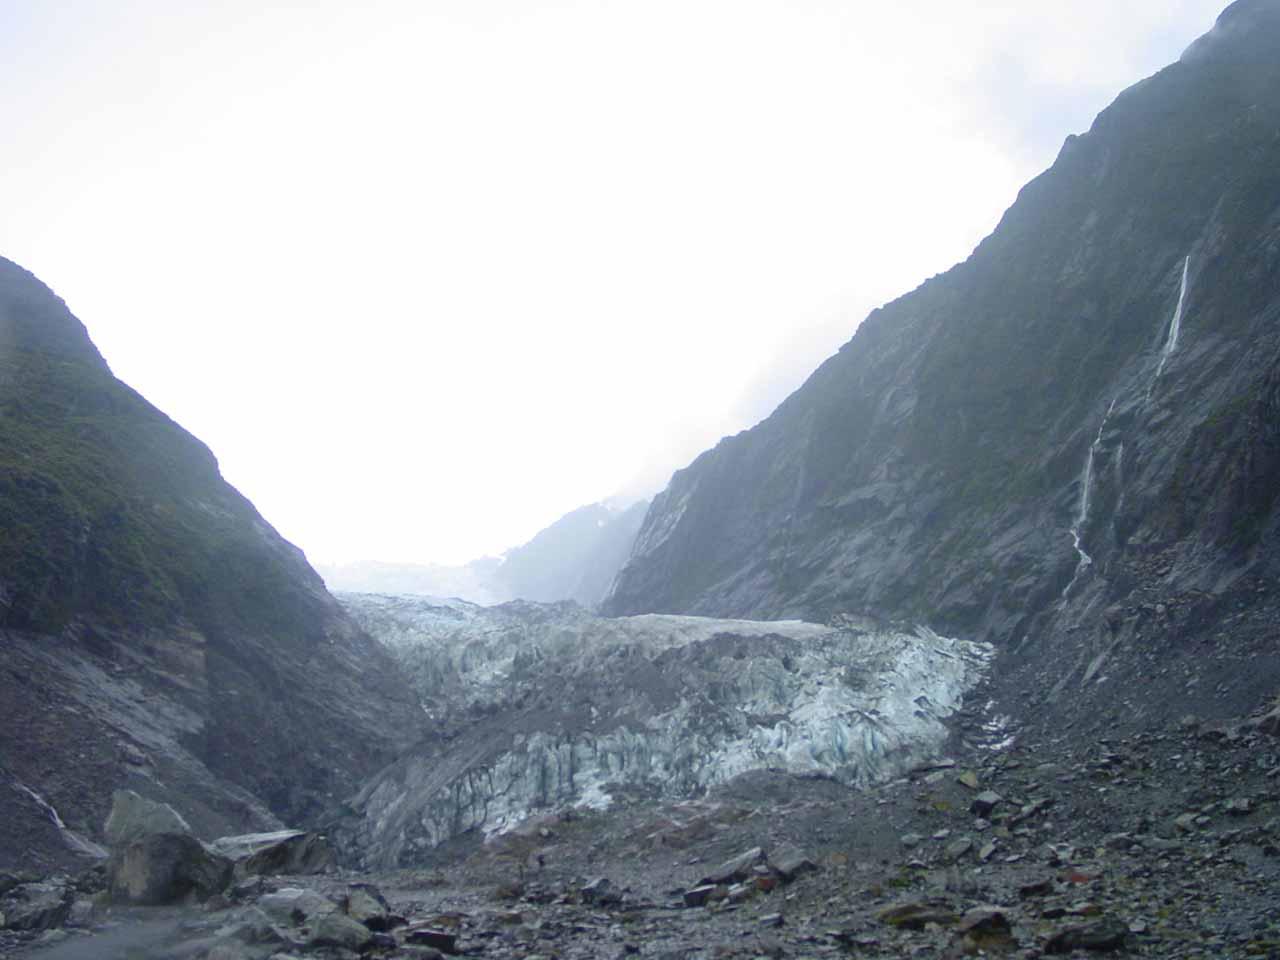 Approaching the Franz Josef Glacier terminus